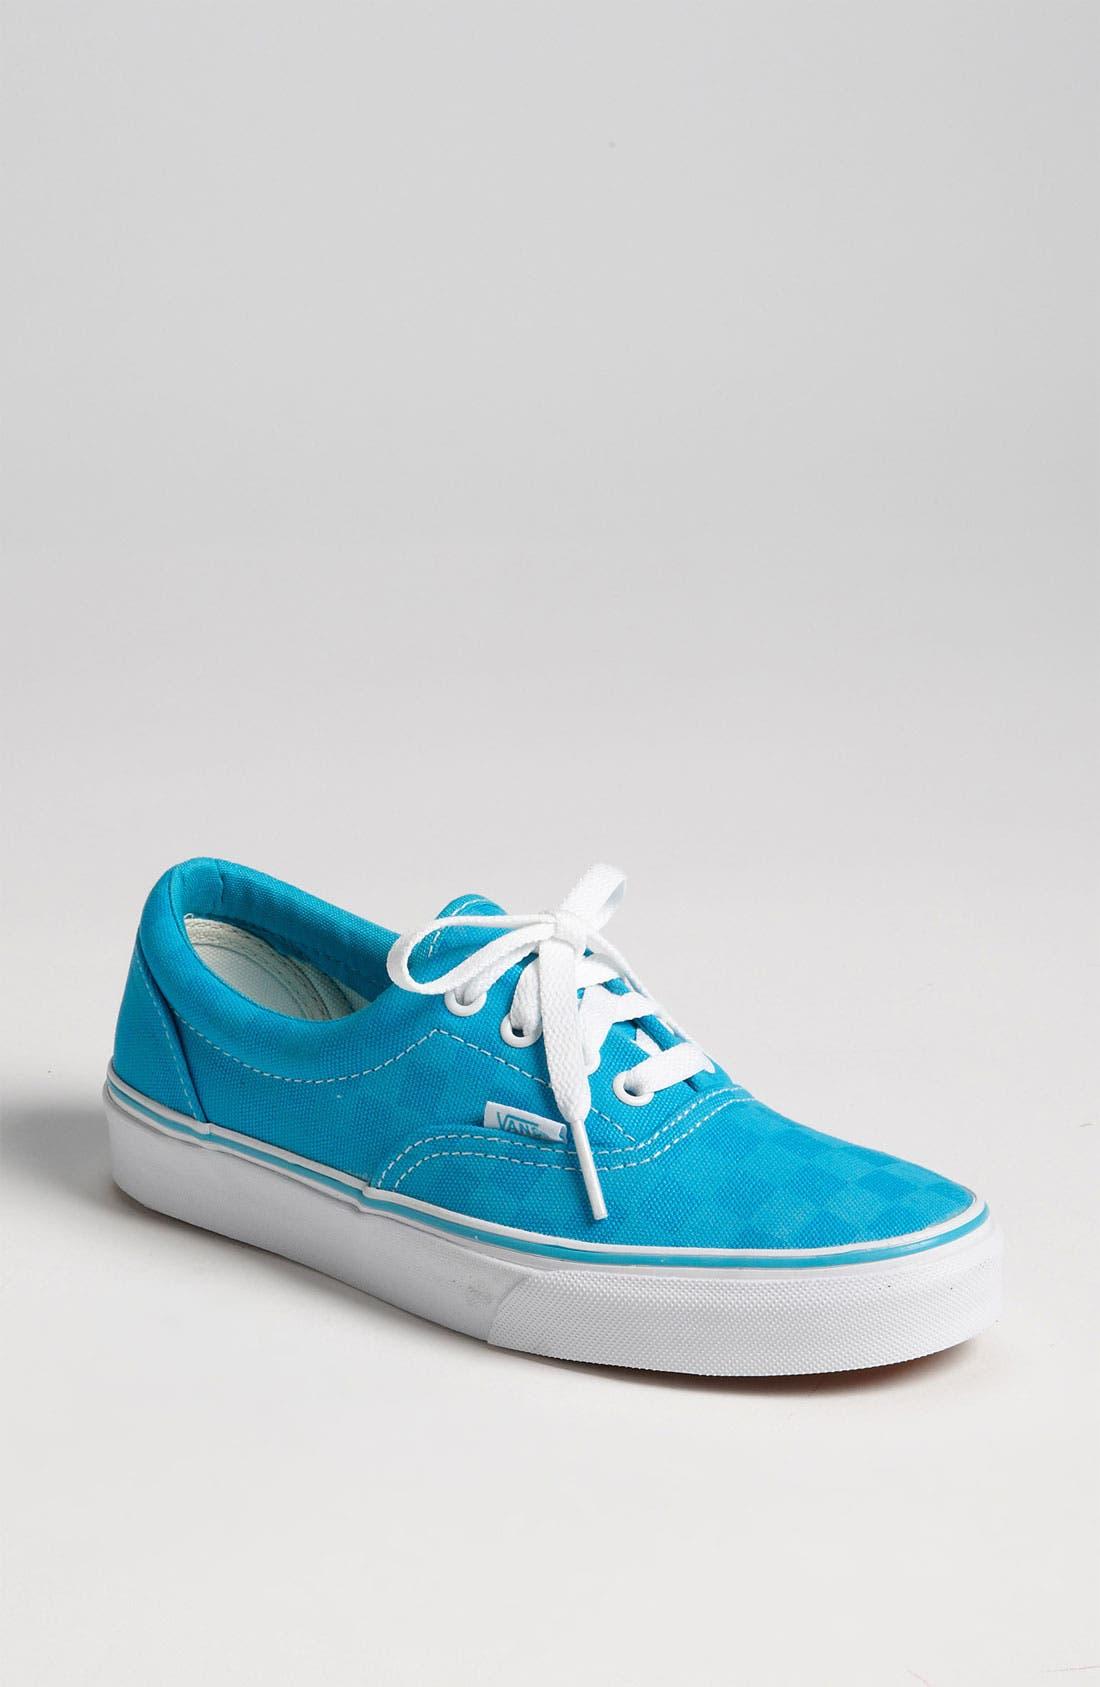 Alternate Image 1 Selected - Vans 'Era' Sneaker (Women)